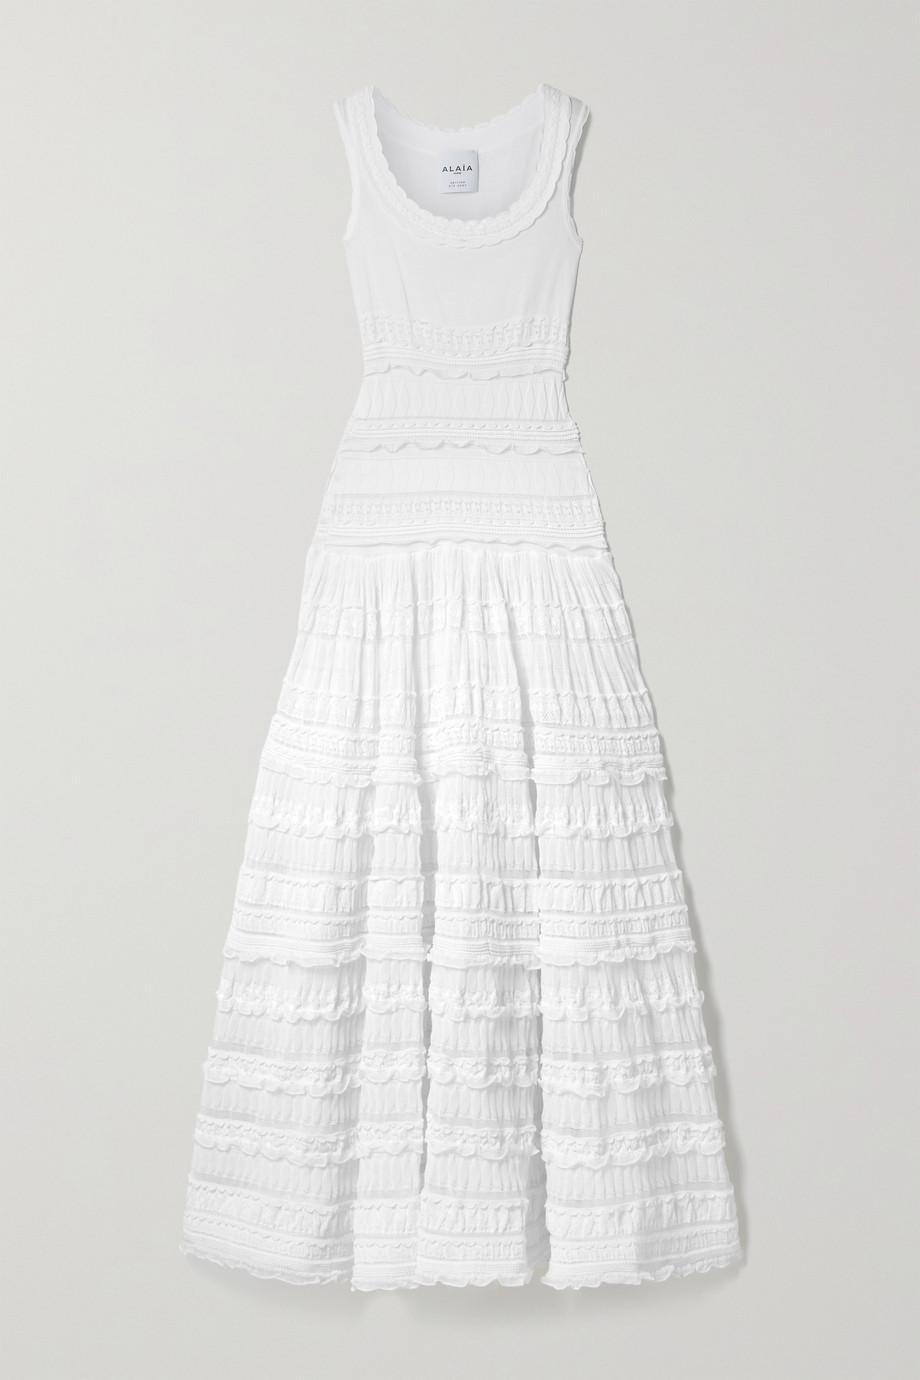 Alaïa Editions ruffled crocheted cotton-blend maxi dress